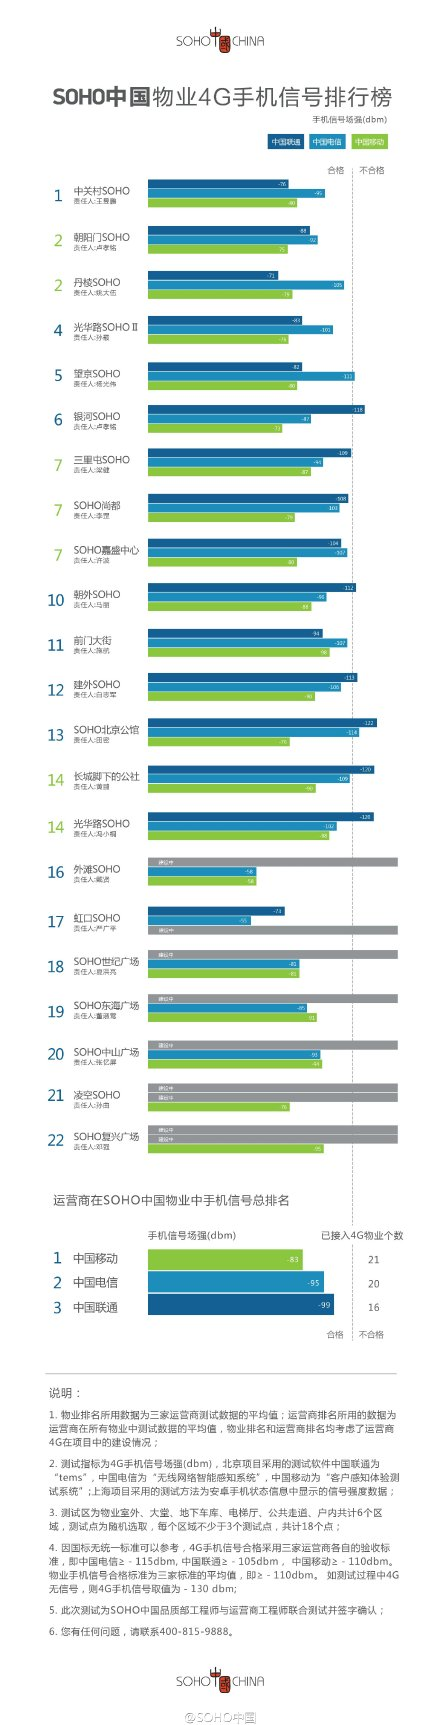 SOHO中国发4G网络信号榜 中国移动领先